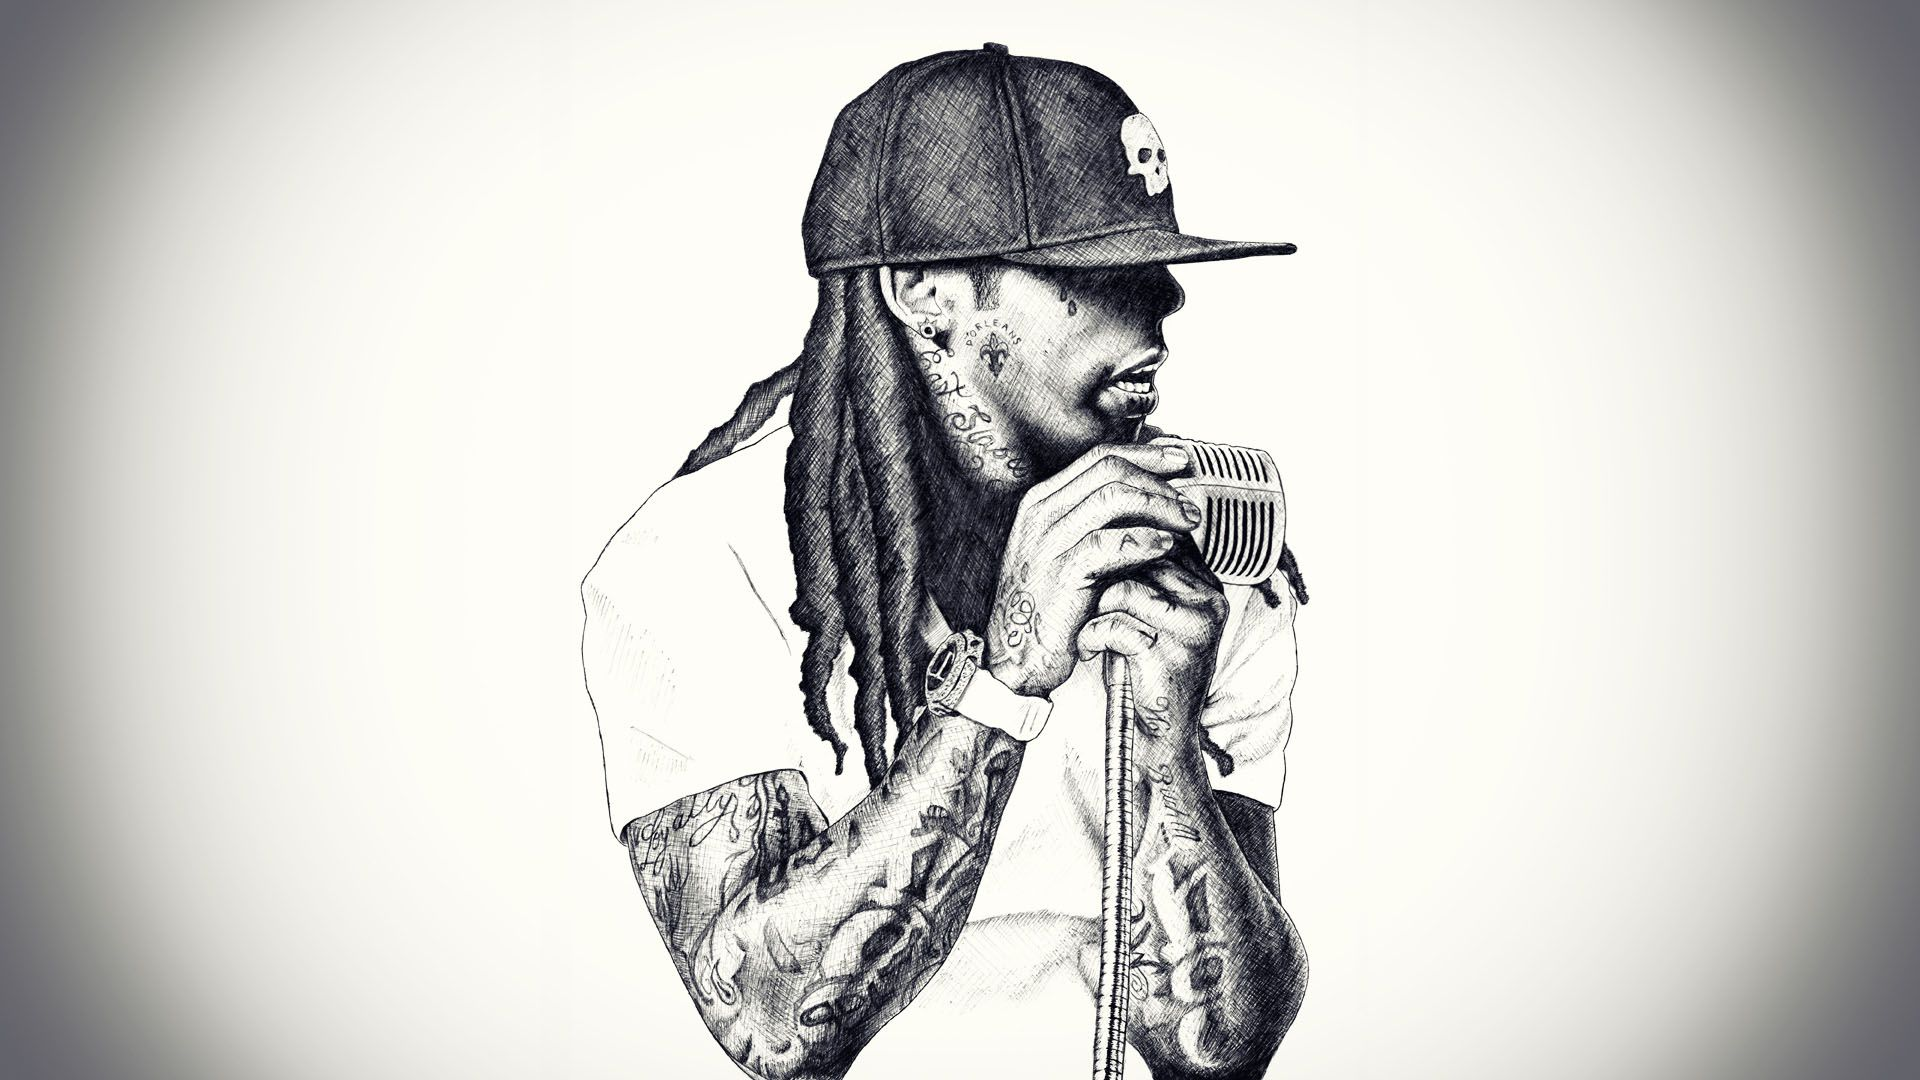 Lil Wayne Wallpapers App Store Revenue Download Estimates Us 1920 1080 Lil Wayne Backgrounds 40 Wallpapers Hip Hop Background Lil Wayne Music Wallpaper